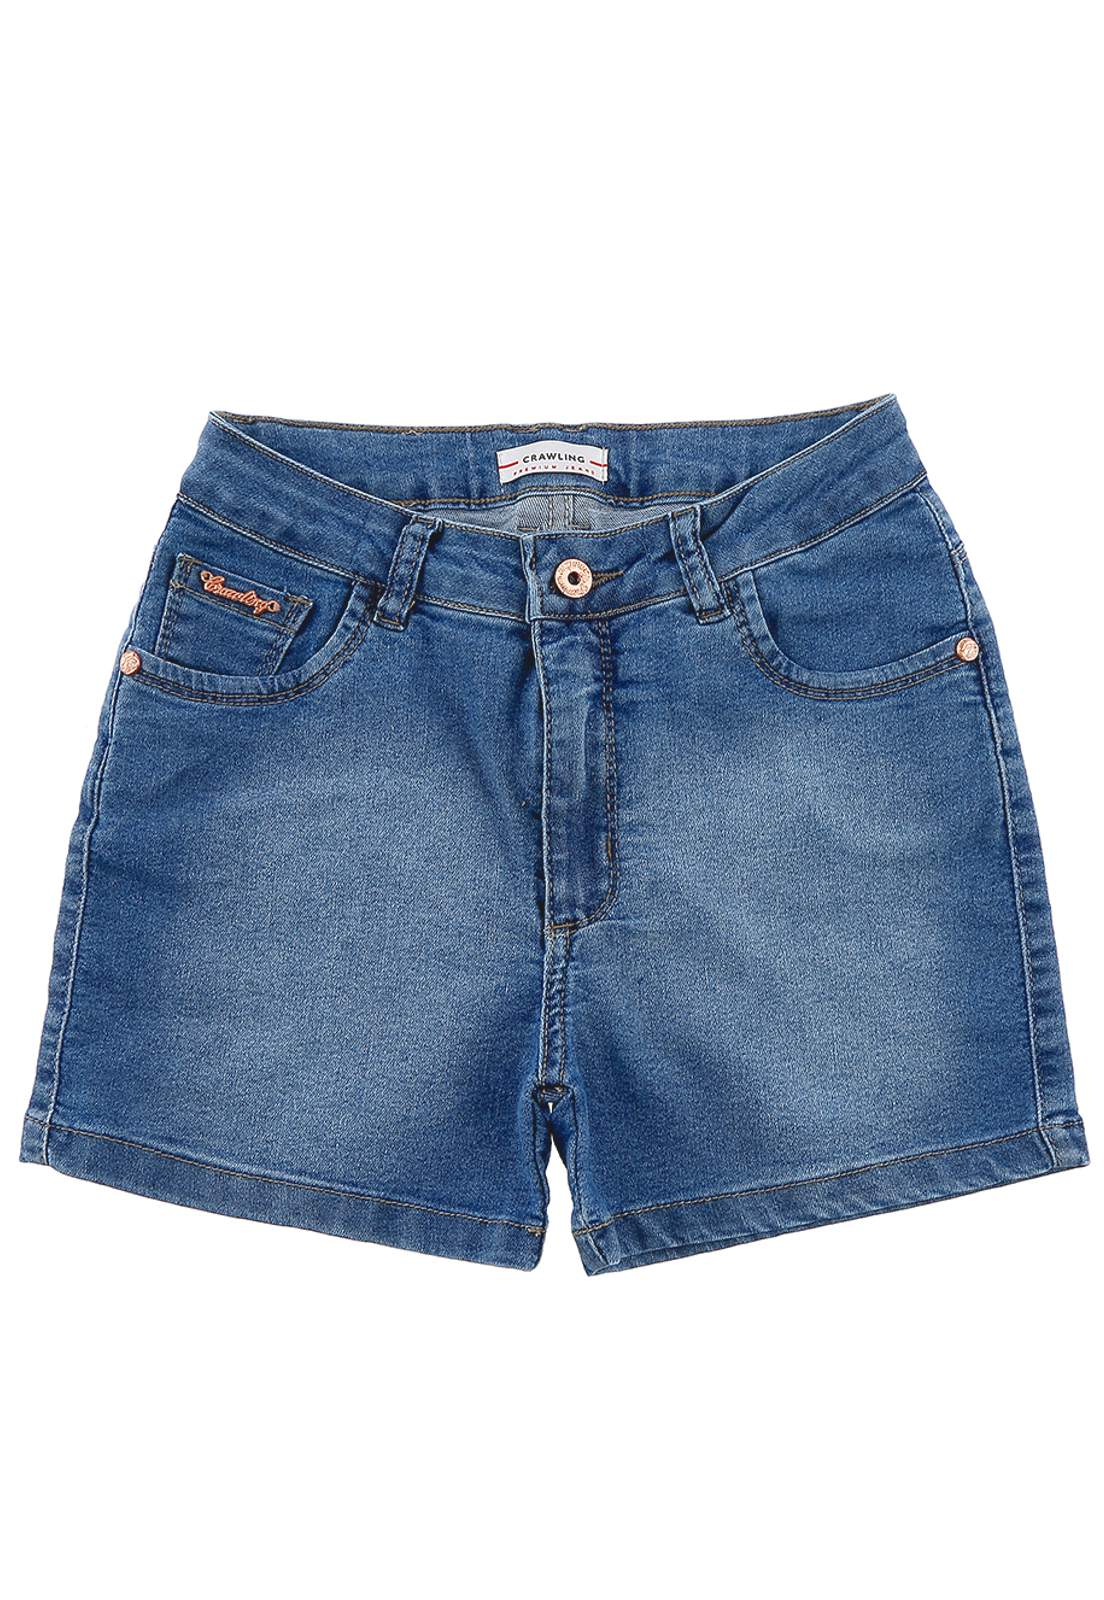 Short Jeans Feminino Meia Coxa Crawling